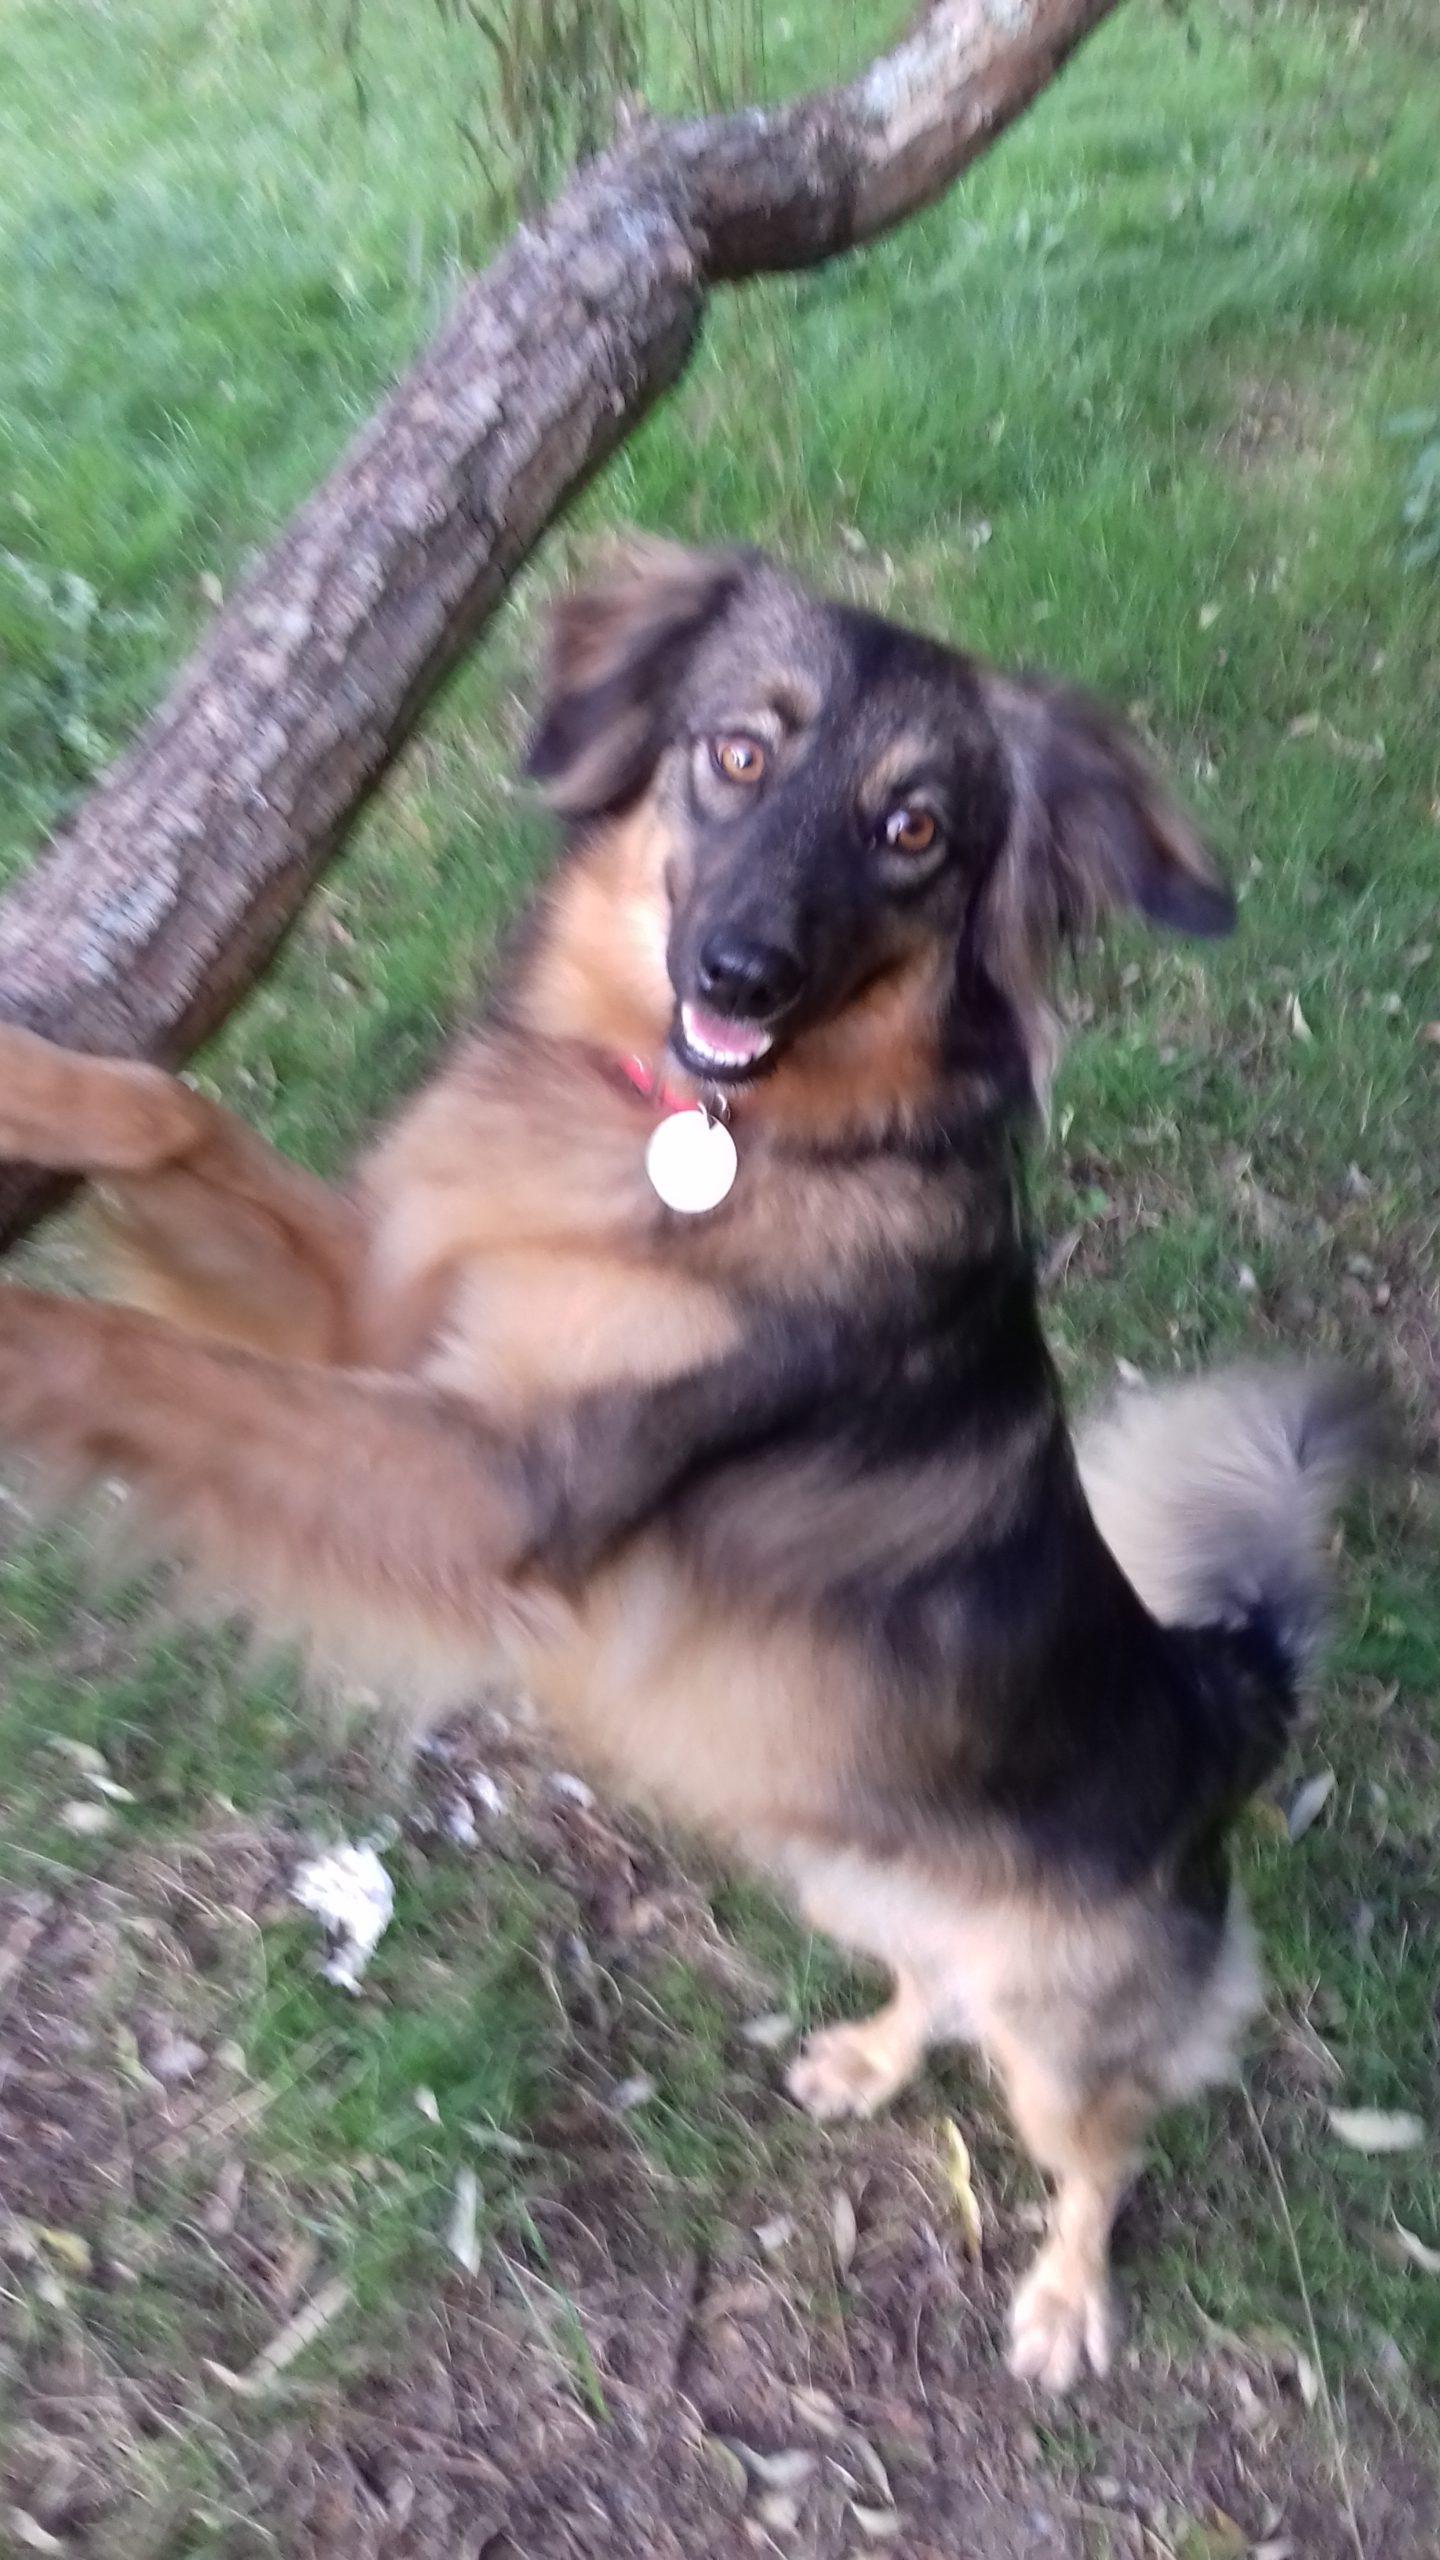 CHALI adopter chien de sochi